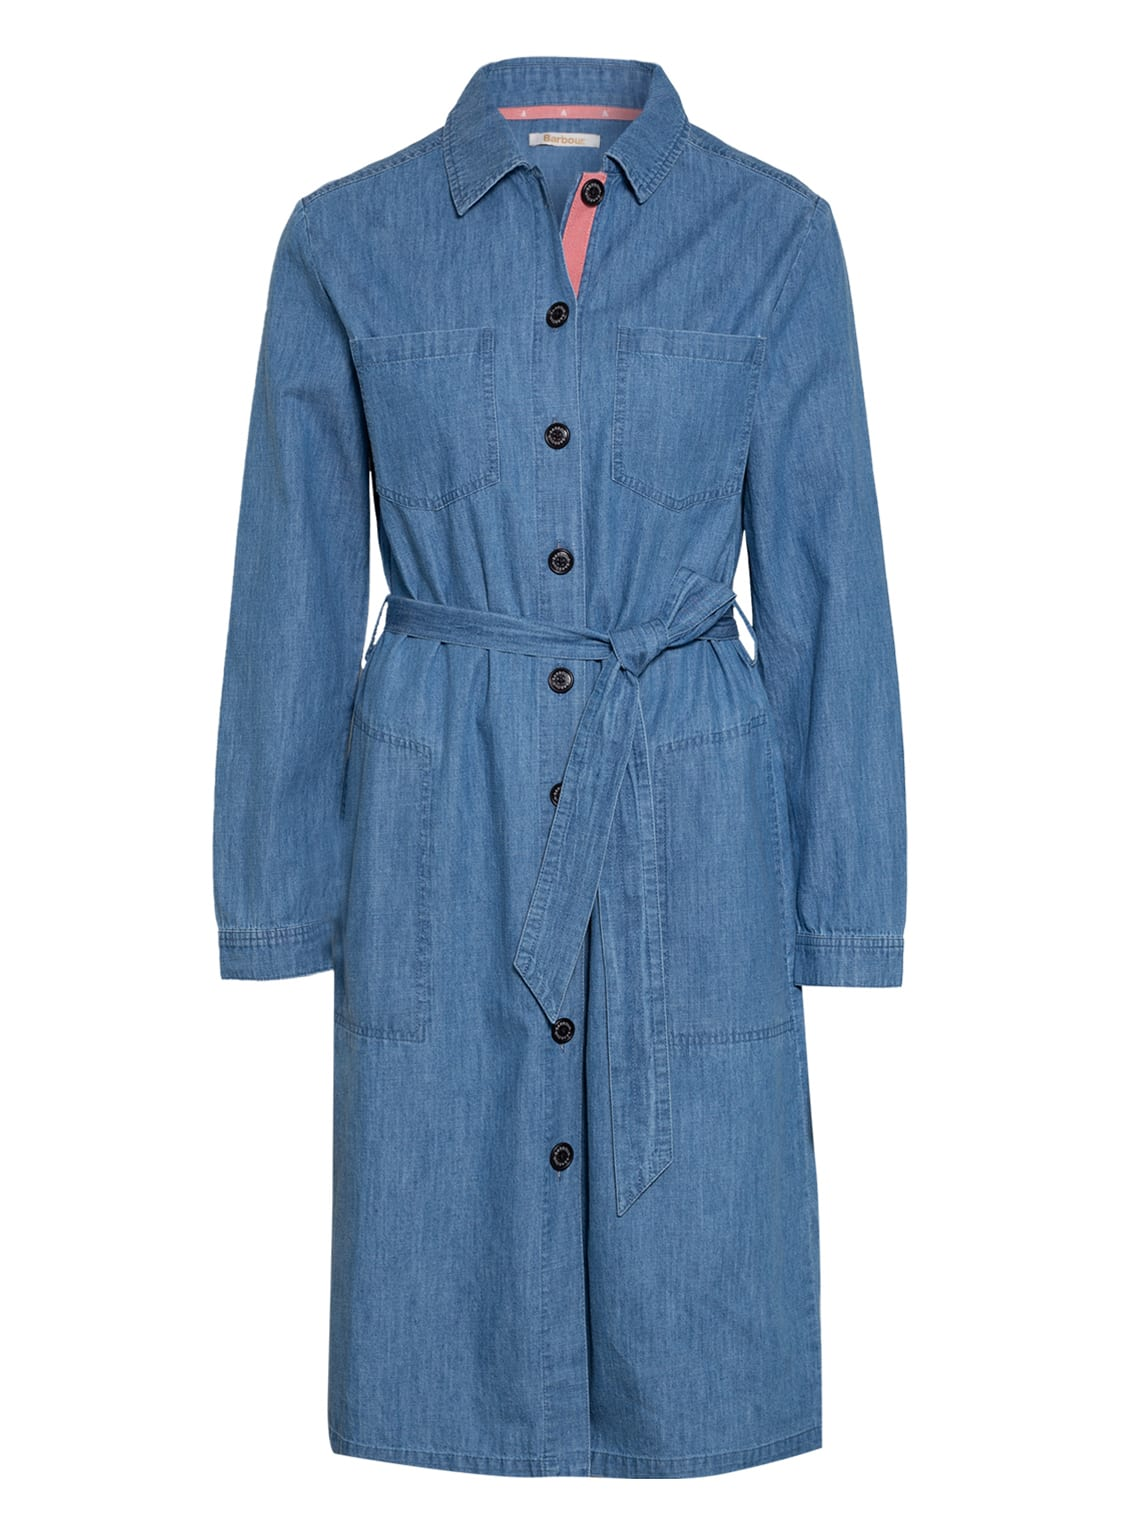 Image of Barbour Hemdblusenkleid Tynemth blau